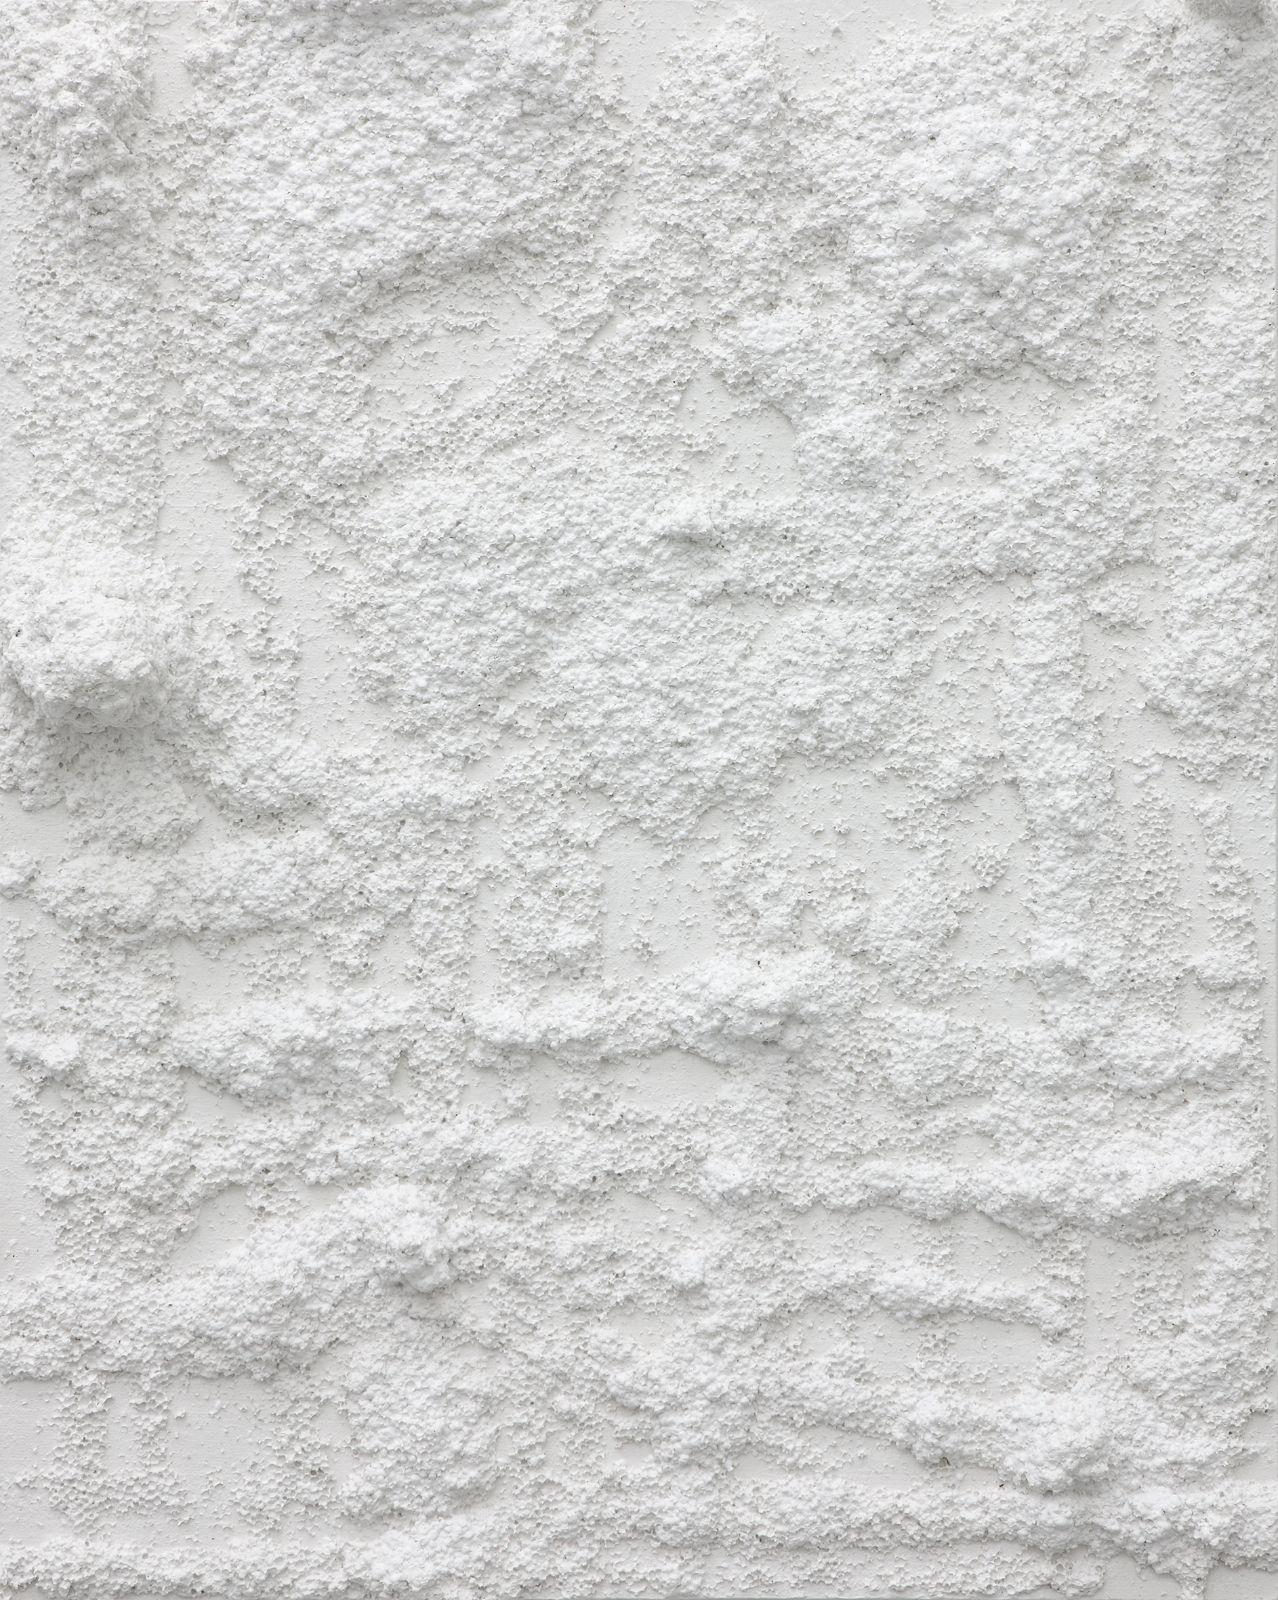 Untitled, 2012, plaster, 75 x 60 x 11,5 cm